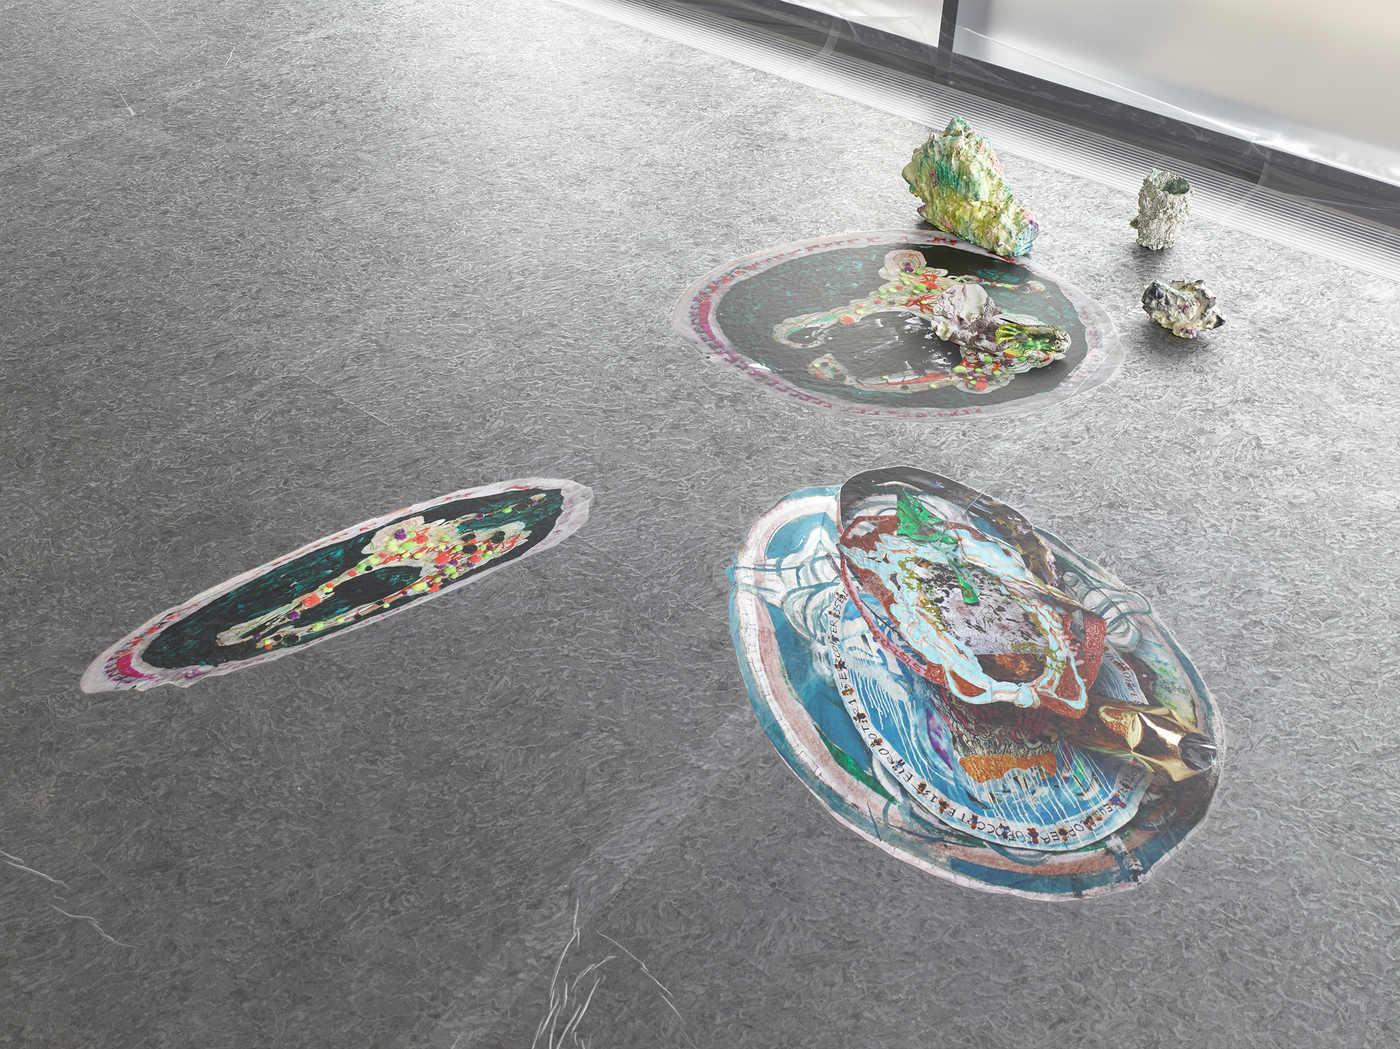 8_Dortmunder Kunstverein_Sam Keogh EUROCOPTER EC135_Photo Simon Vogel